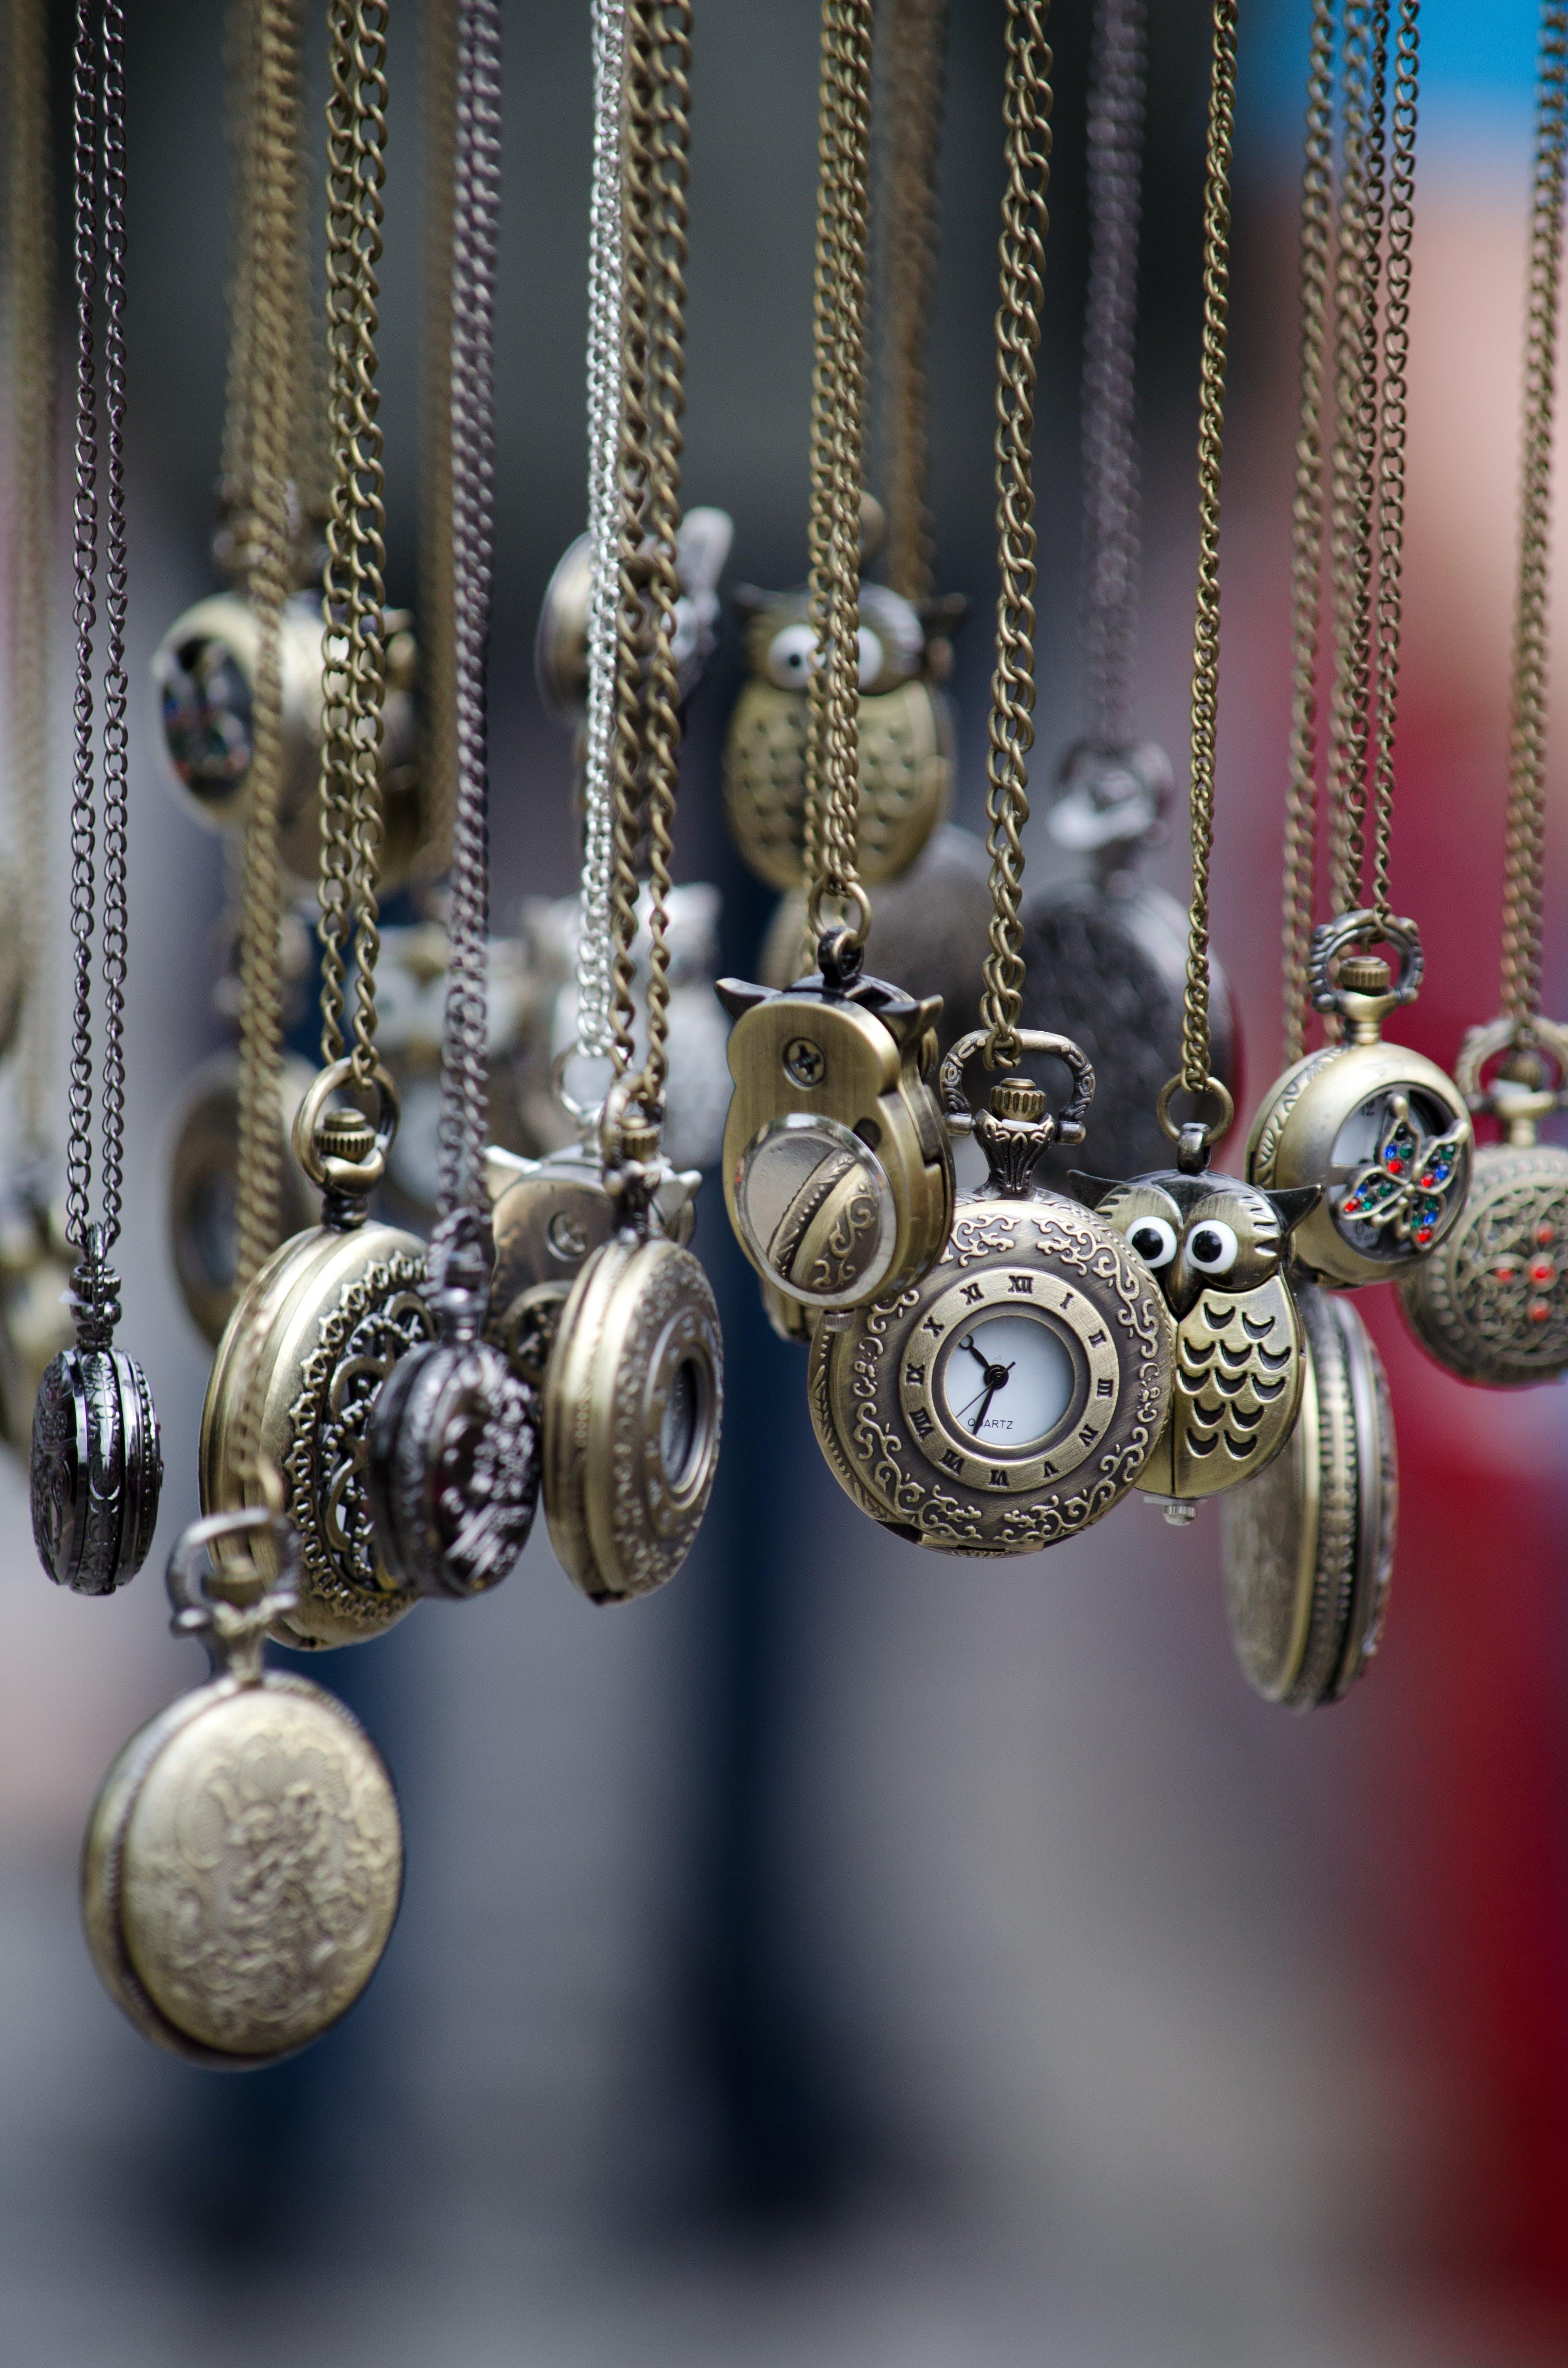 Assorted Gold Round Pocket Watches